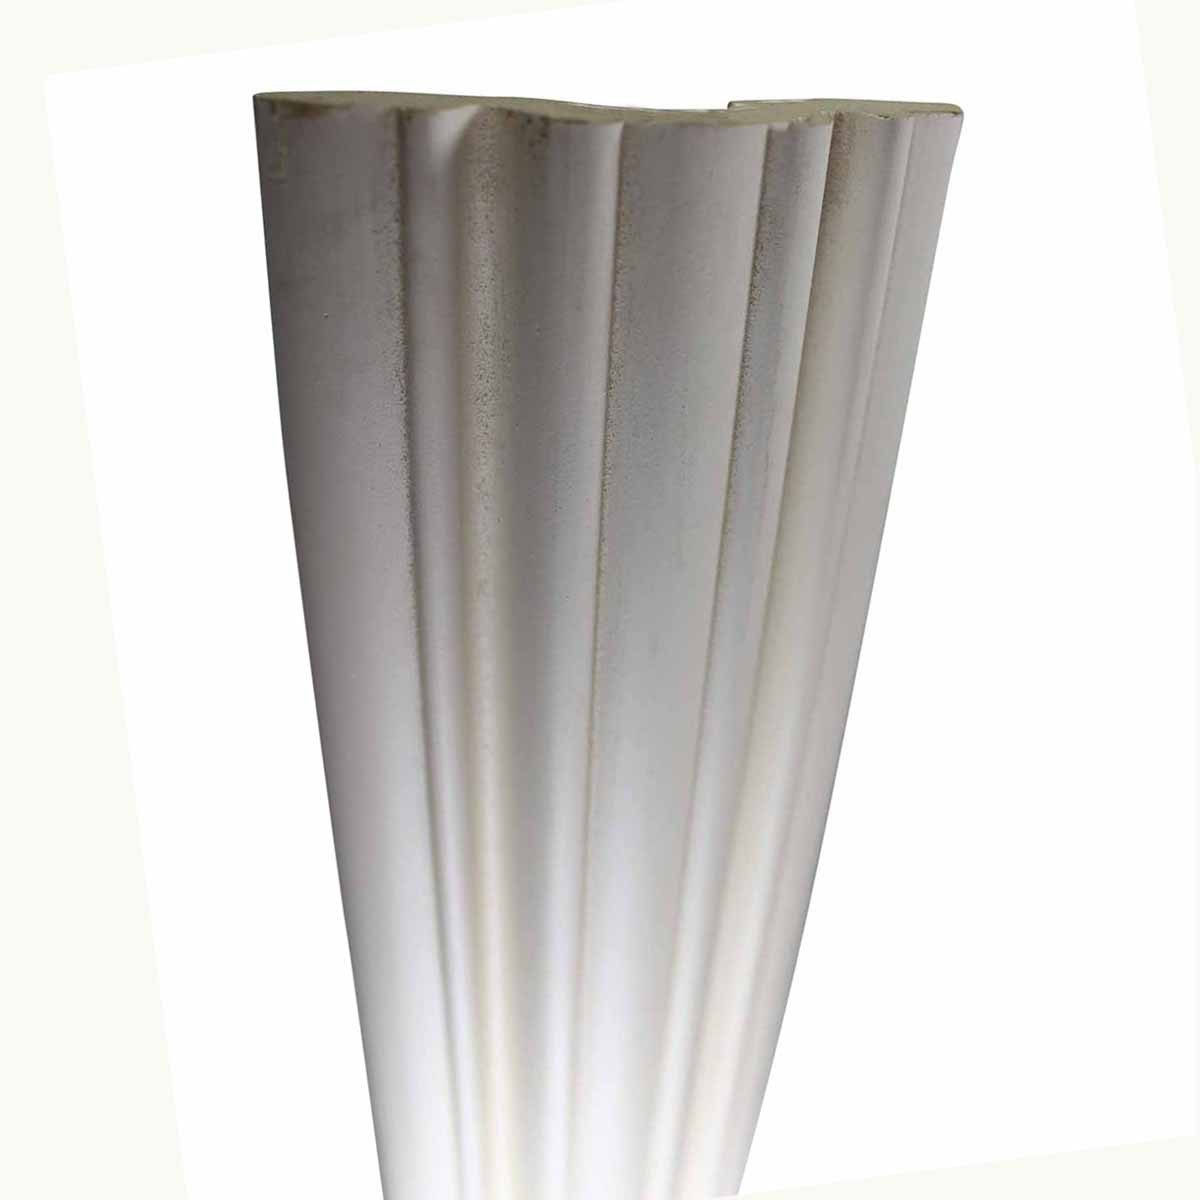 Cornice White Urethane Sample of 11505 24 Long Cornice Cornice Moulding Cornice Molding